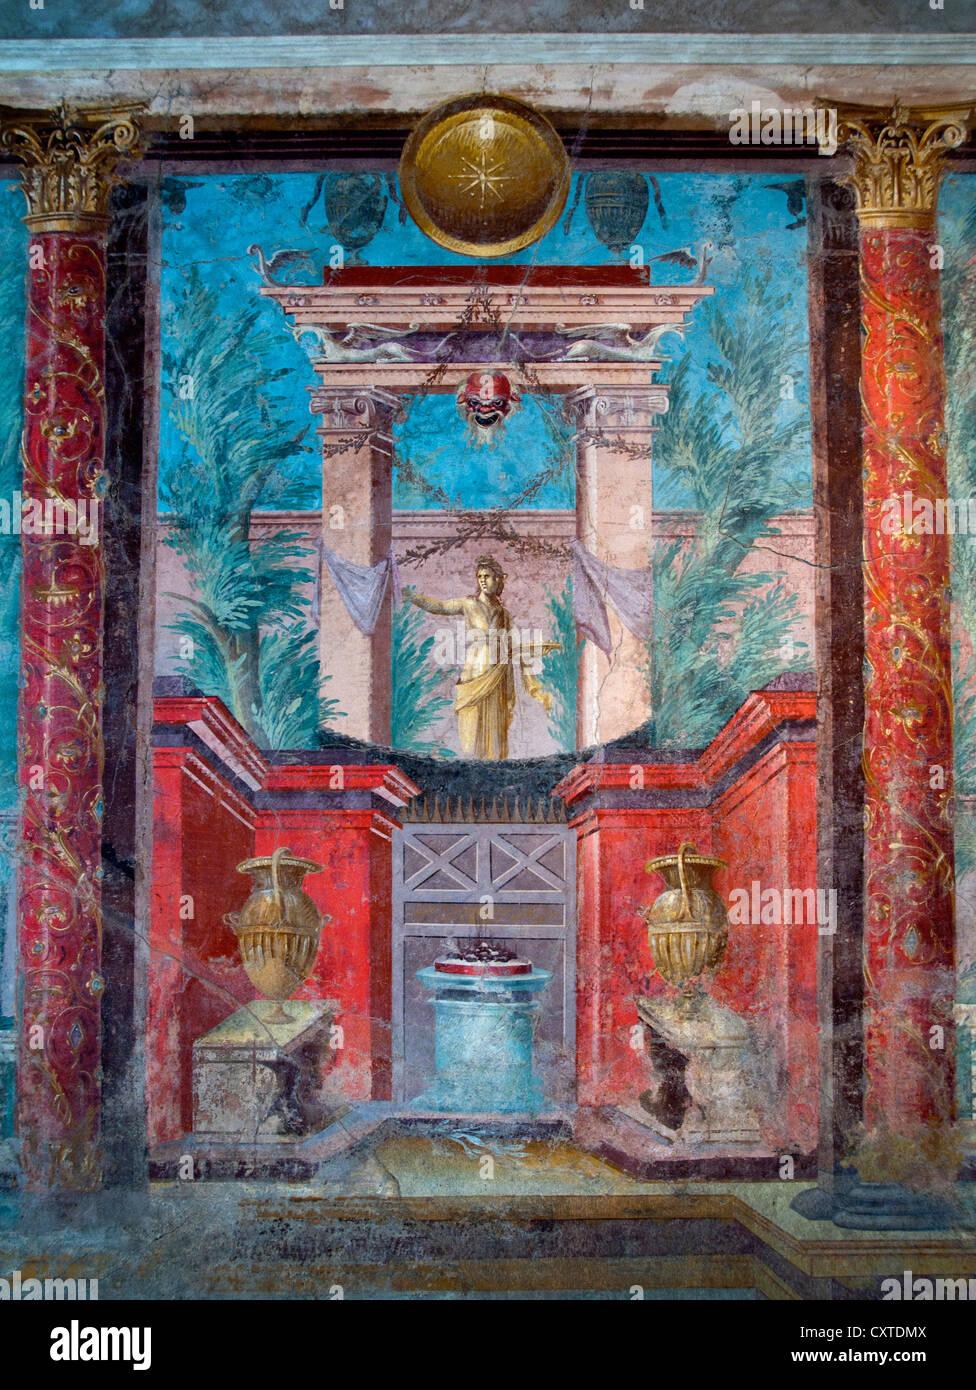 Boscoreale Wall Paintings